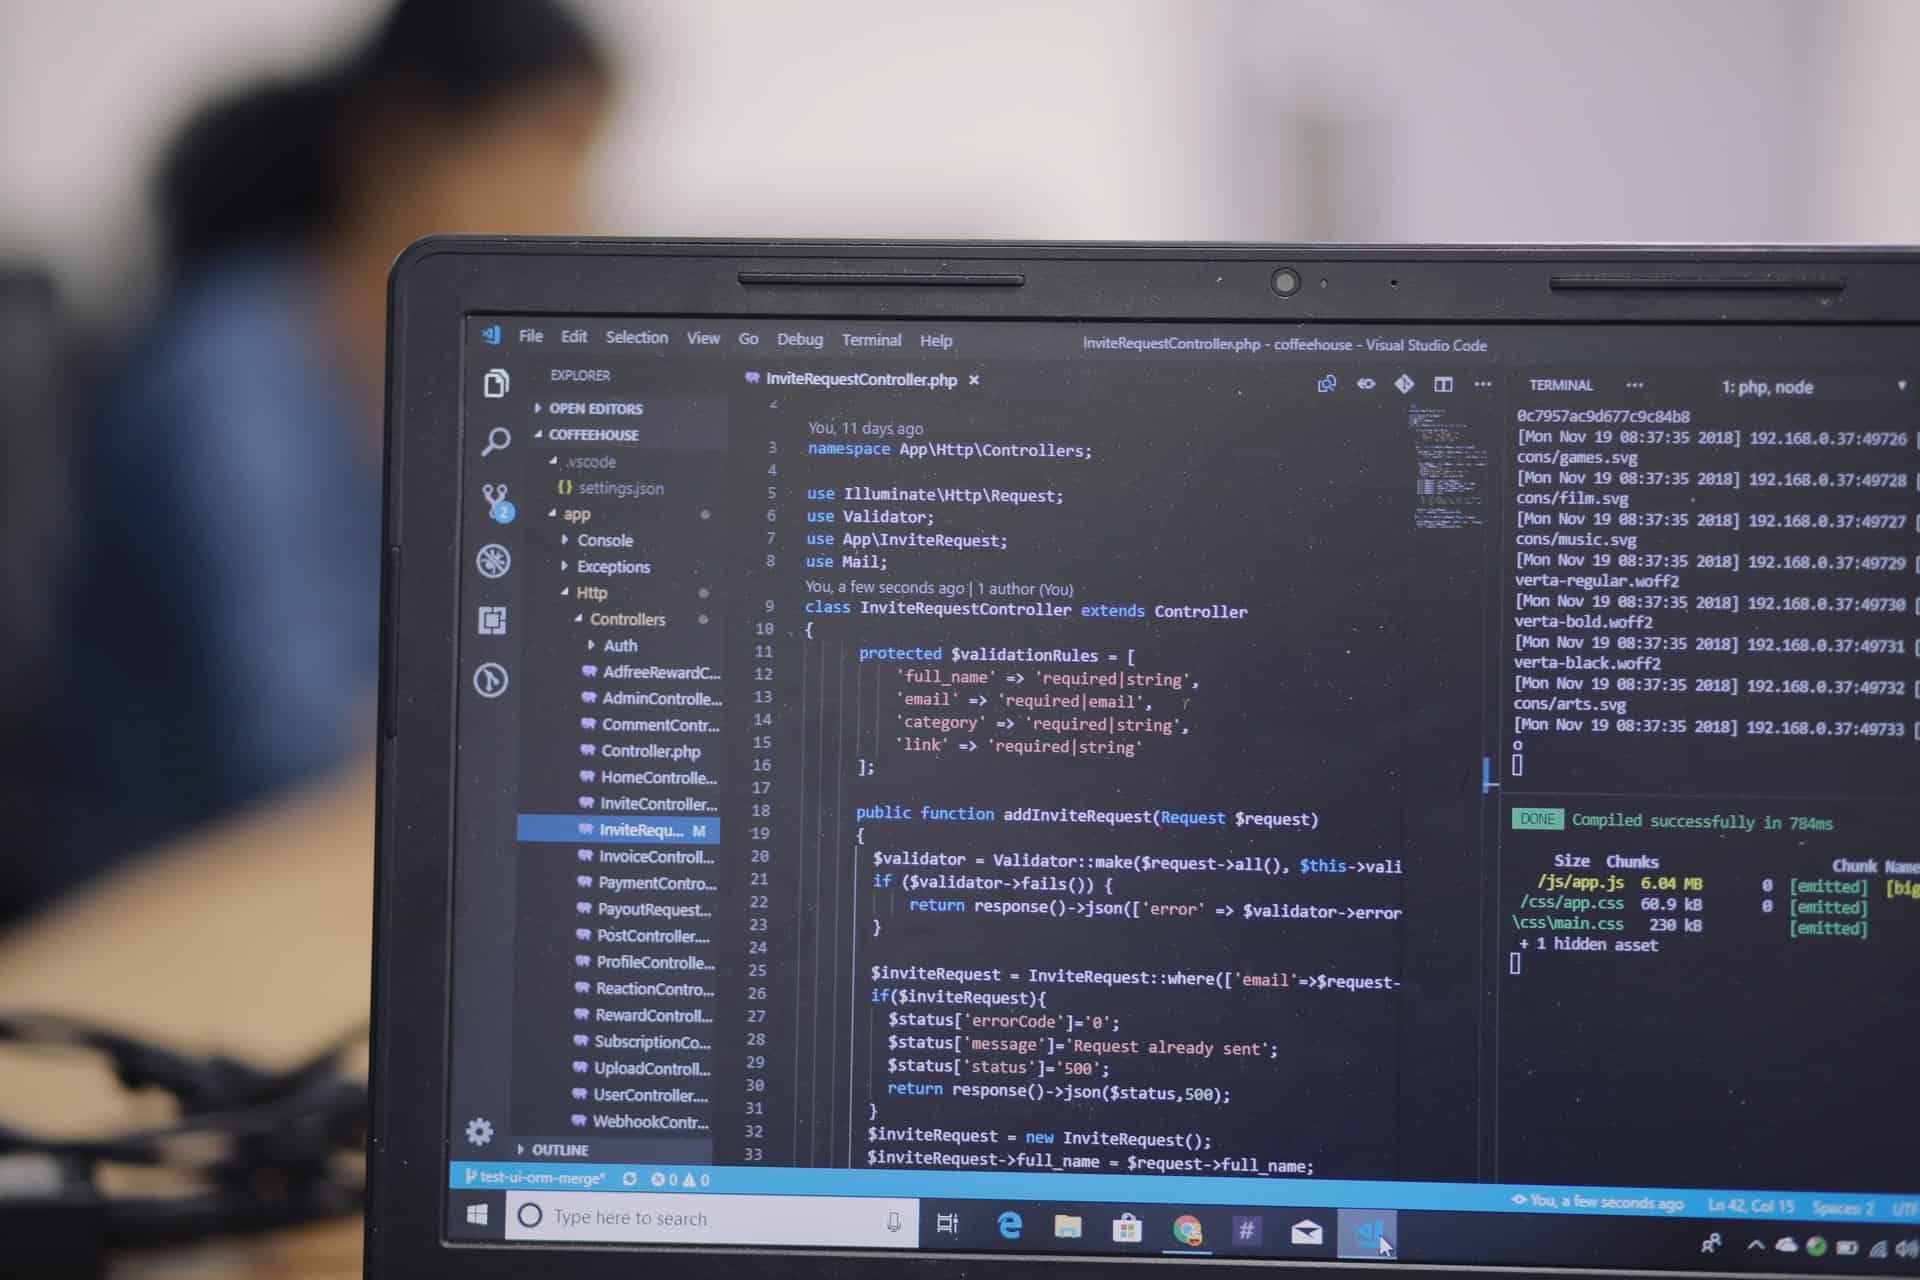 Code editor in dark mode open on laptop